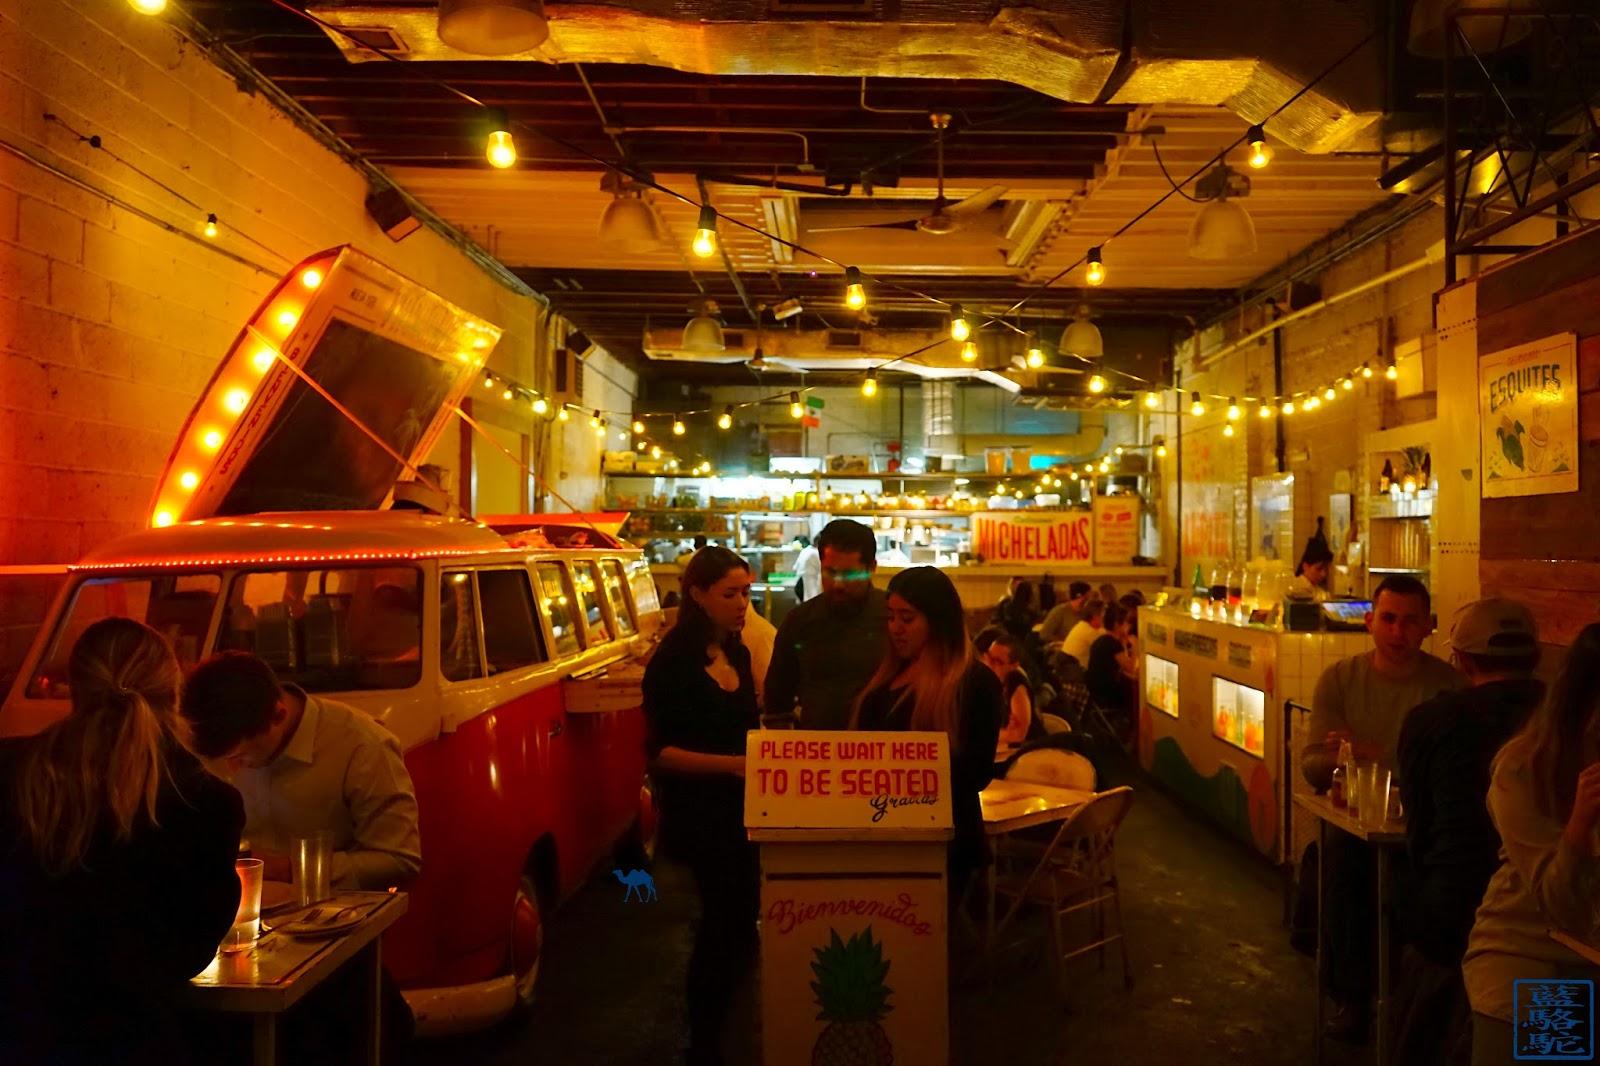 Le Chameau Bleu - Tacombi - Restaurant Mexicain à New York USA